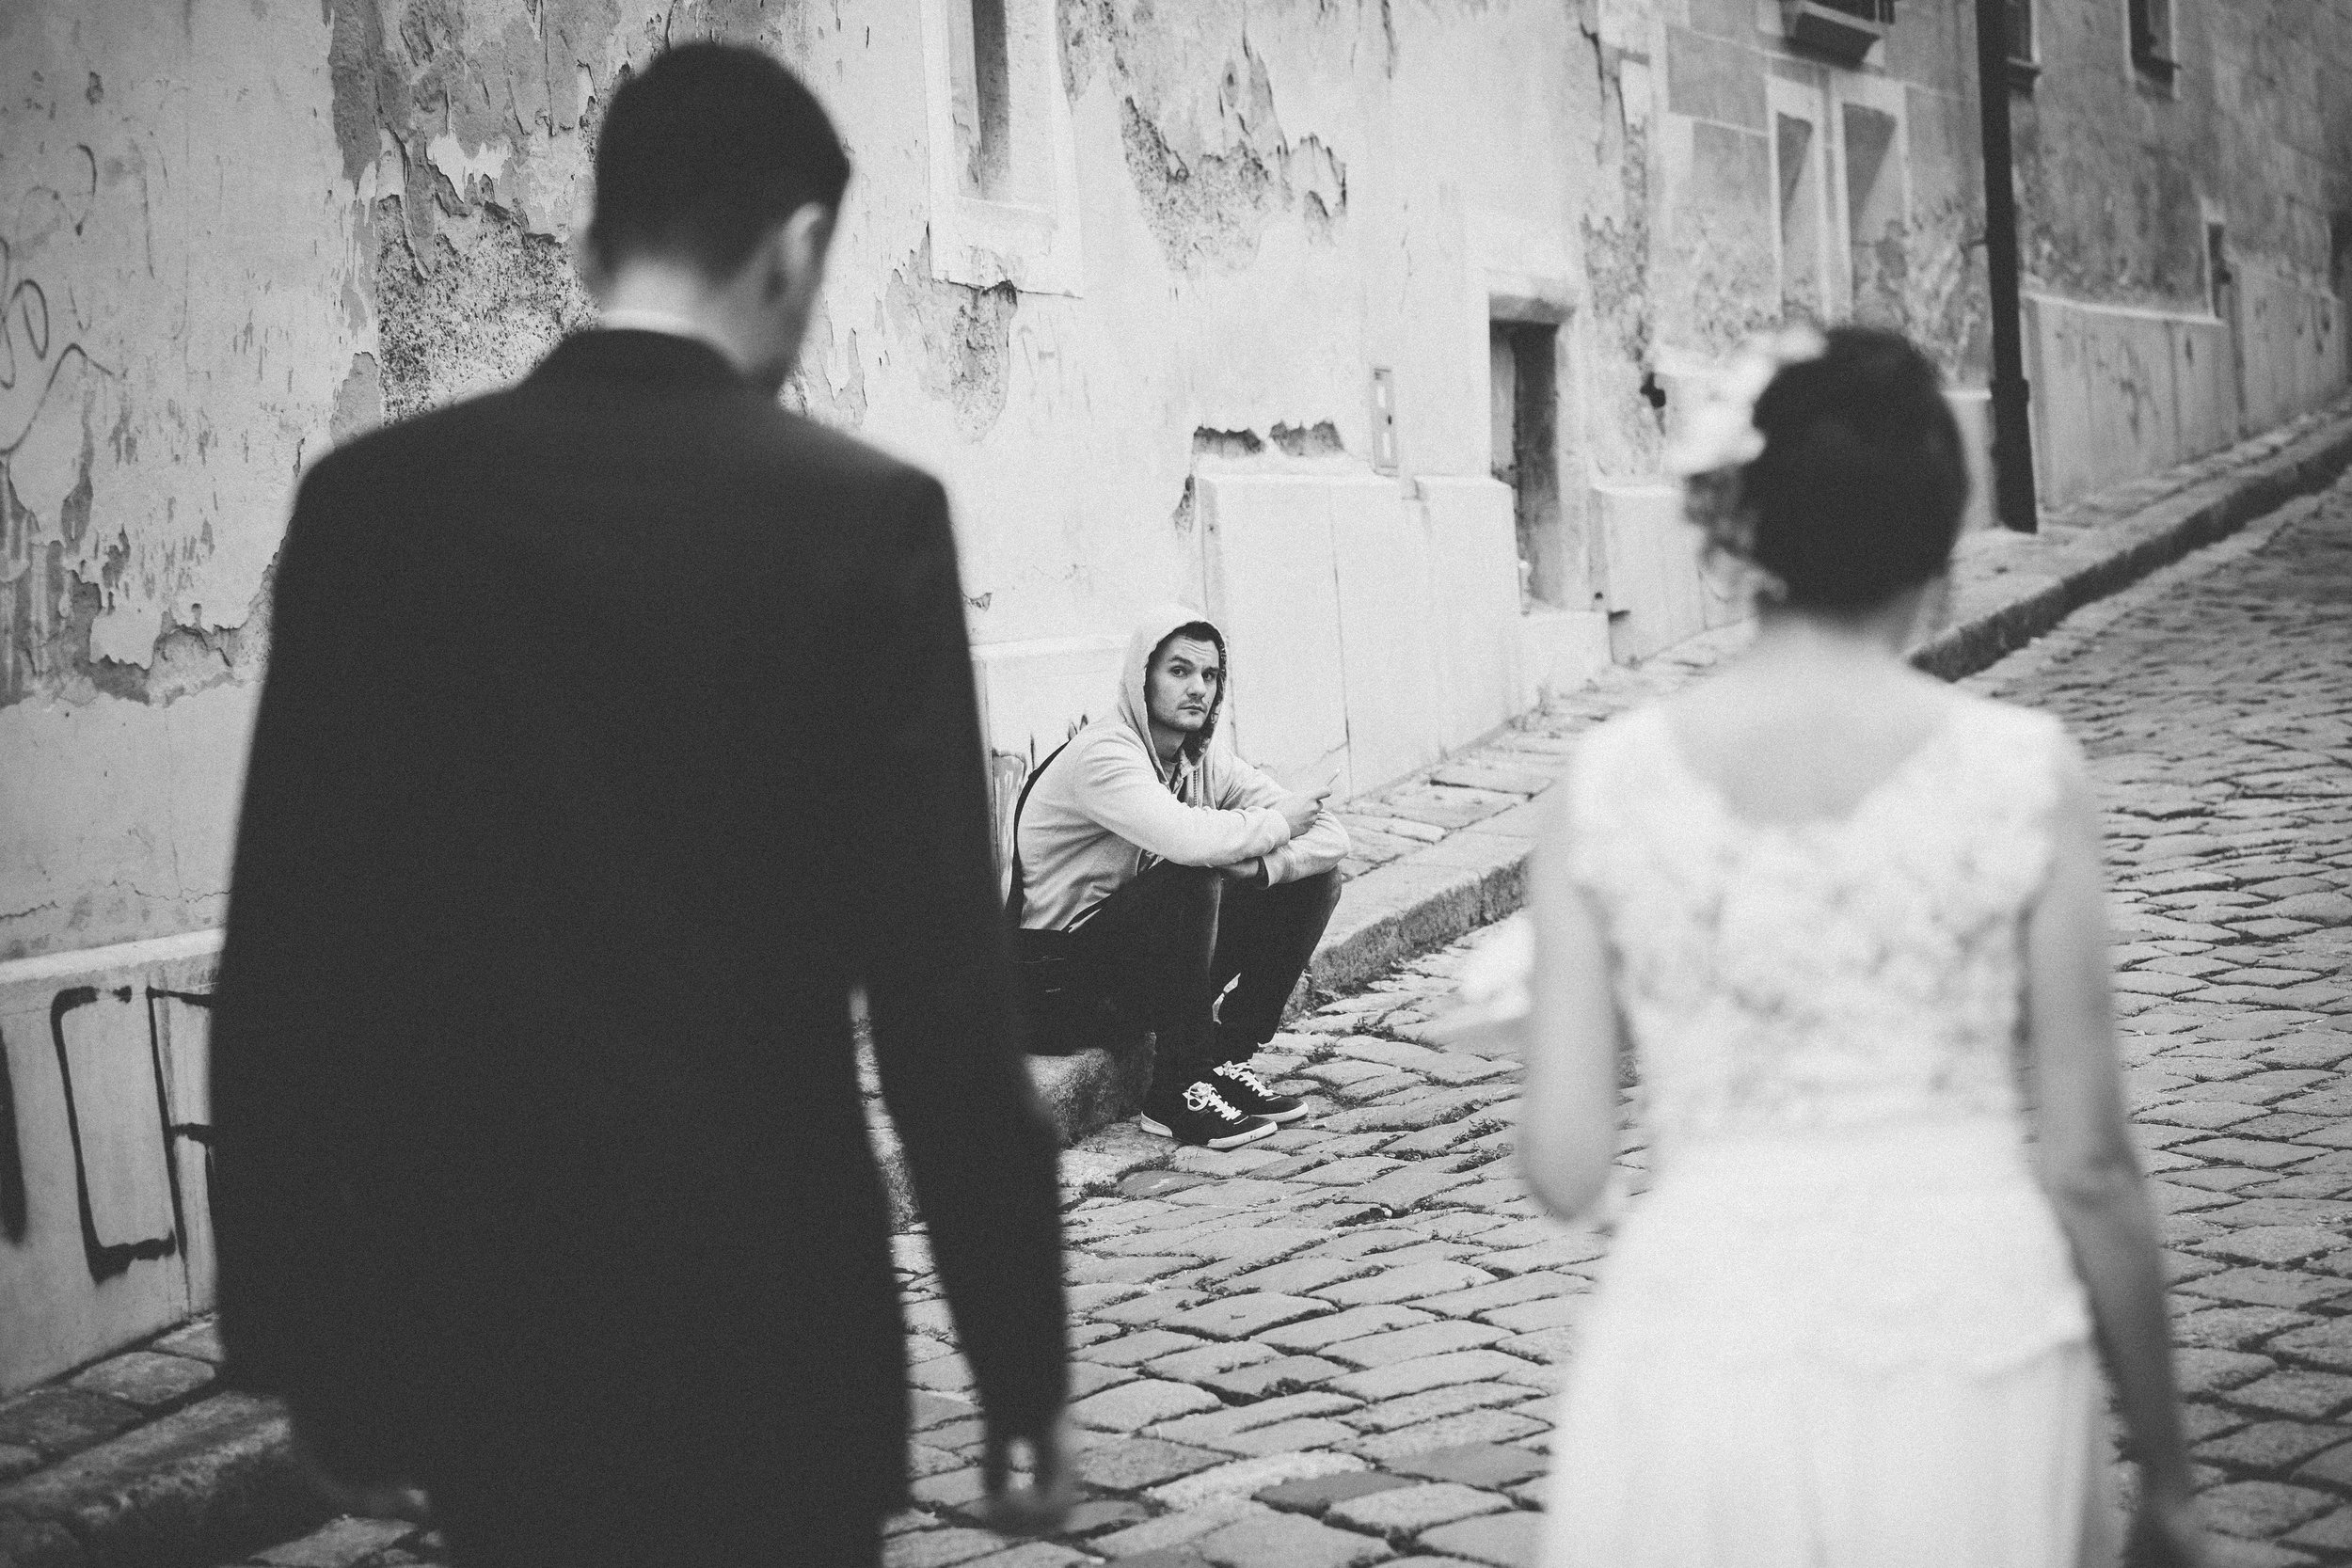 destination-wedding-photographer-bratislava-slovakia-europe-portrait-session-bw-docu.jpg